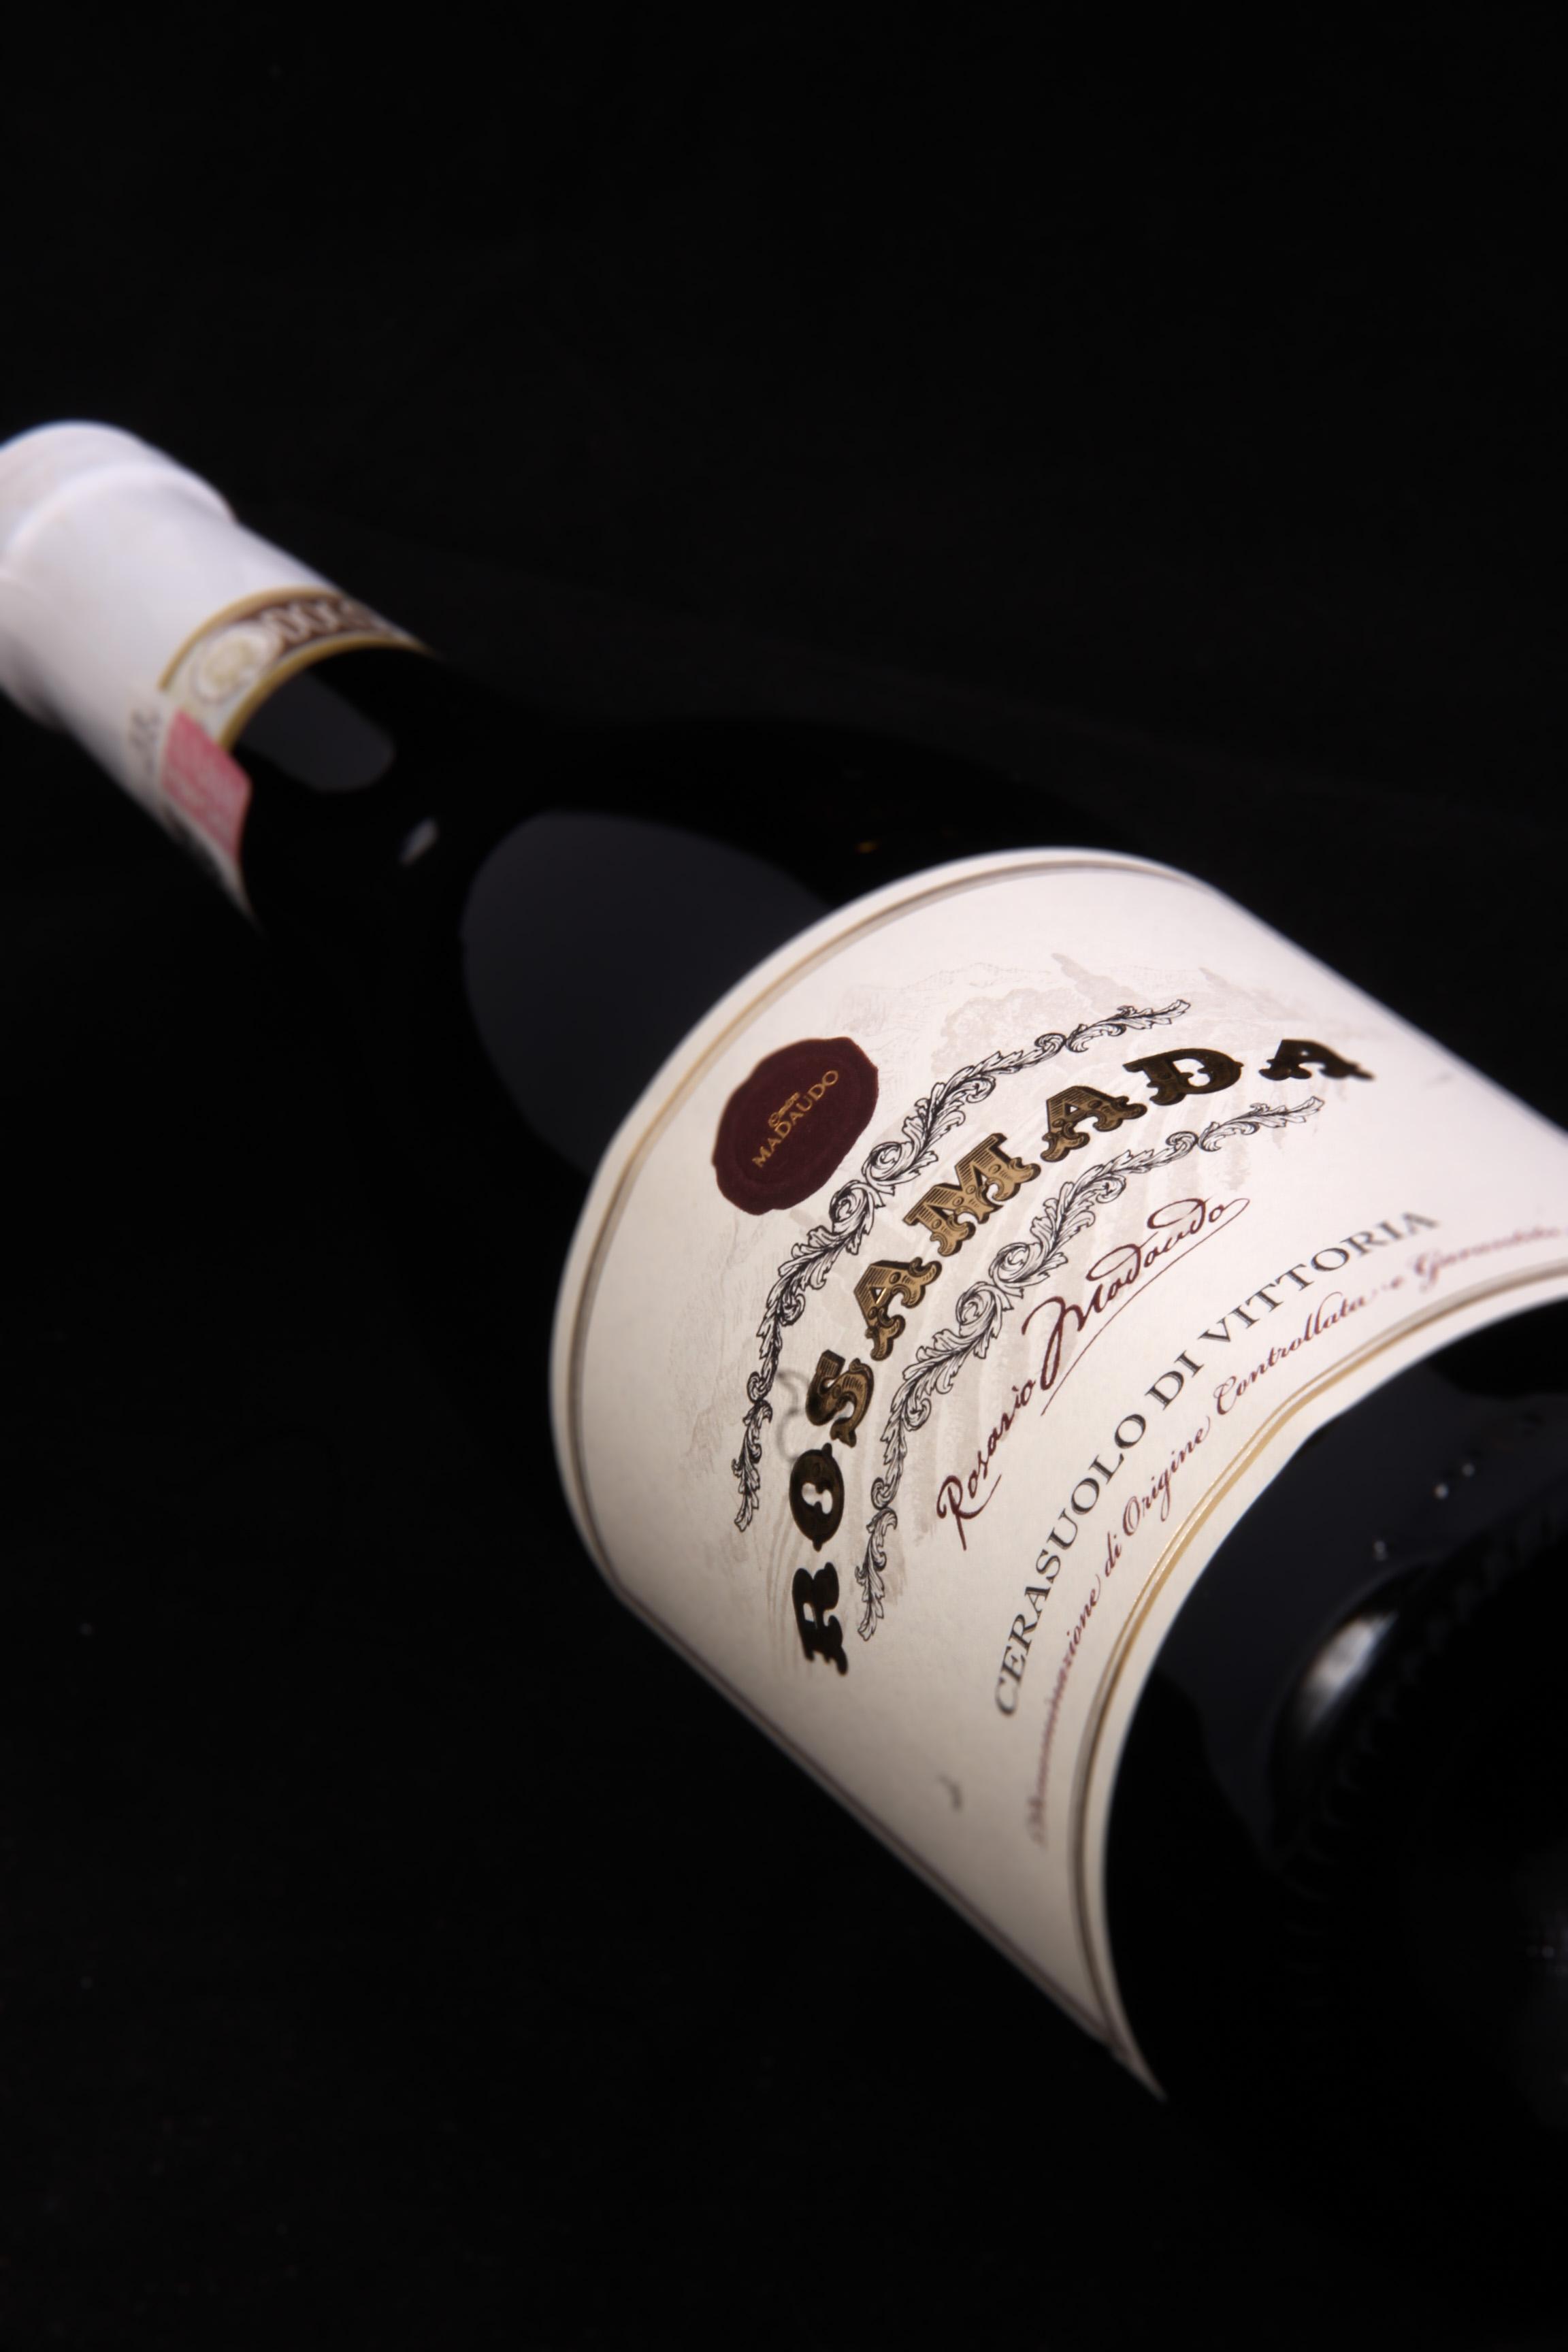 vino_nostrum-importadora_de_vinos-33